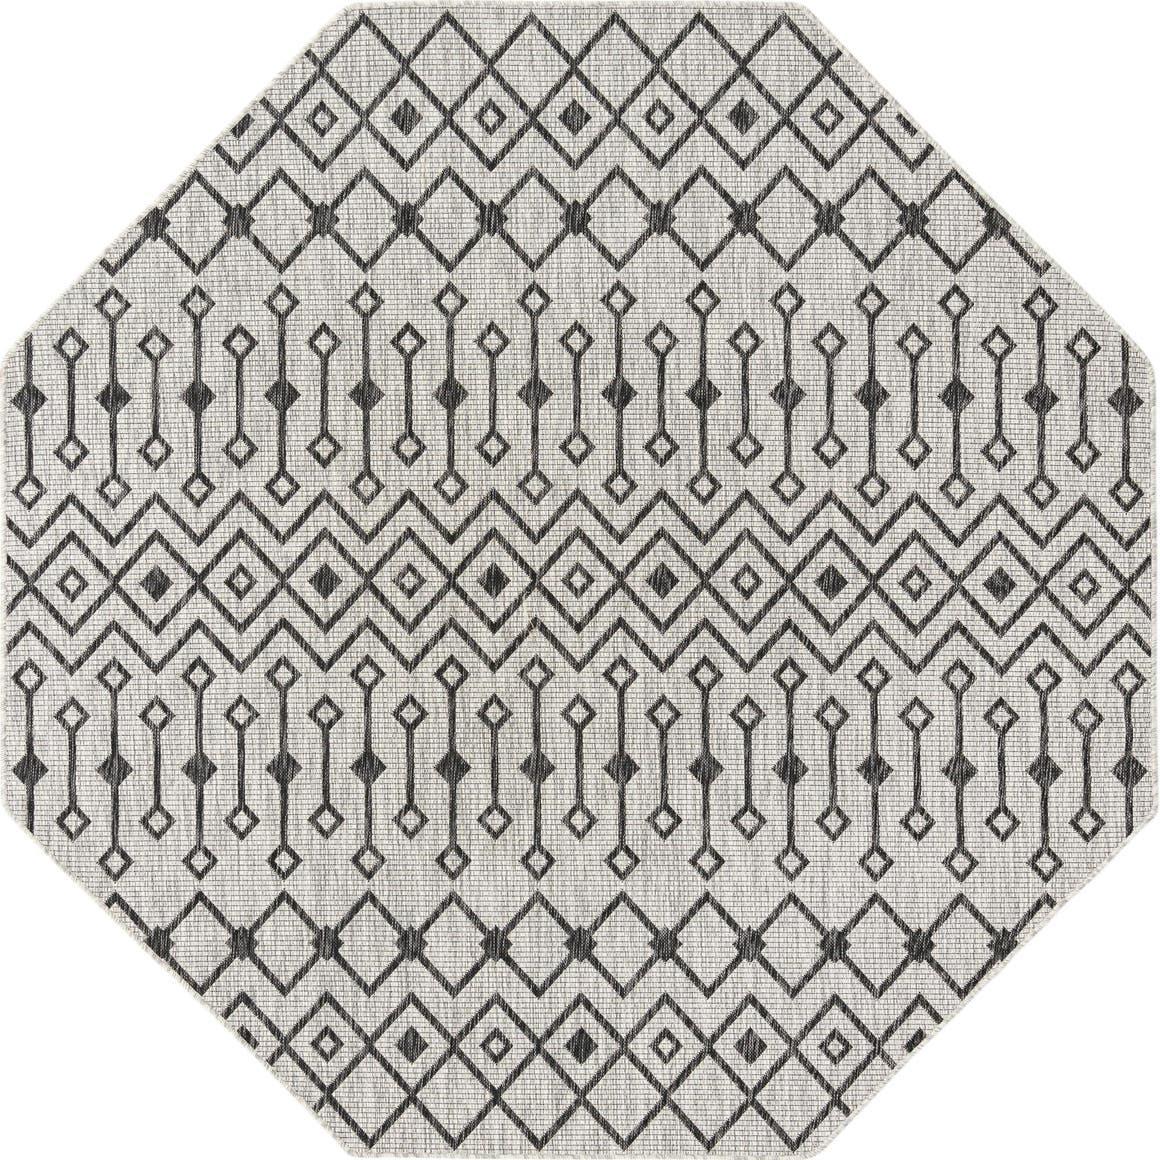 7' 10 x 7' 10 Outdoor Trellis Octagon Rug main image